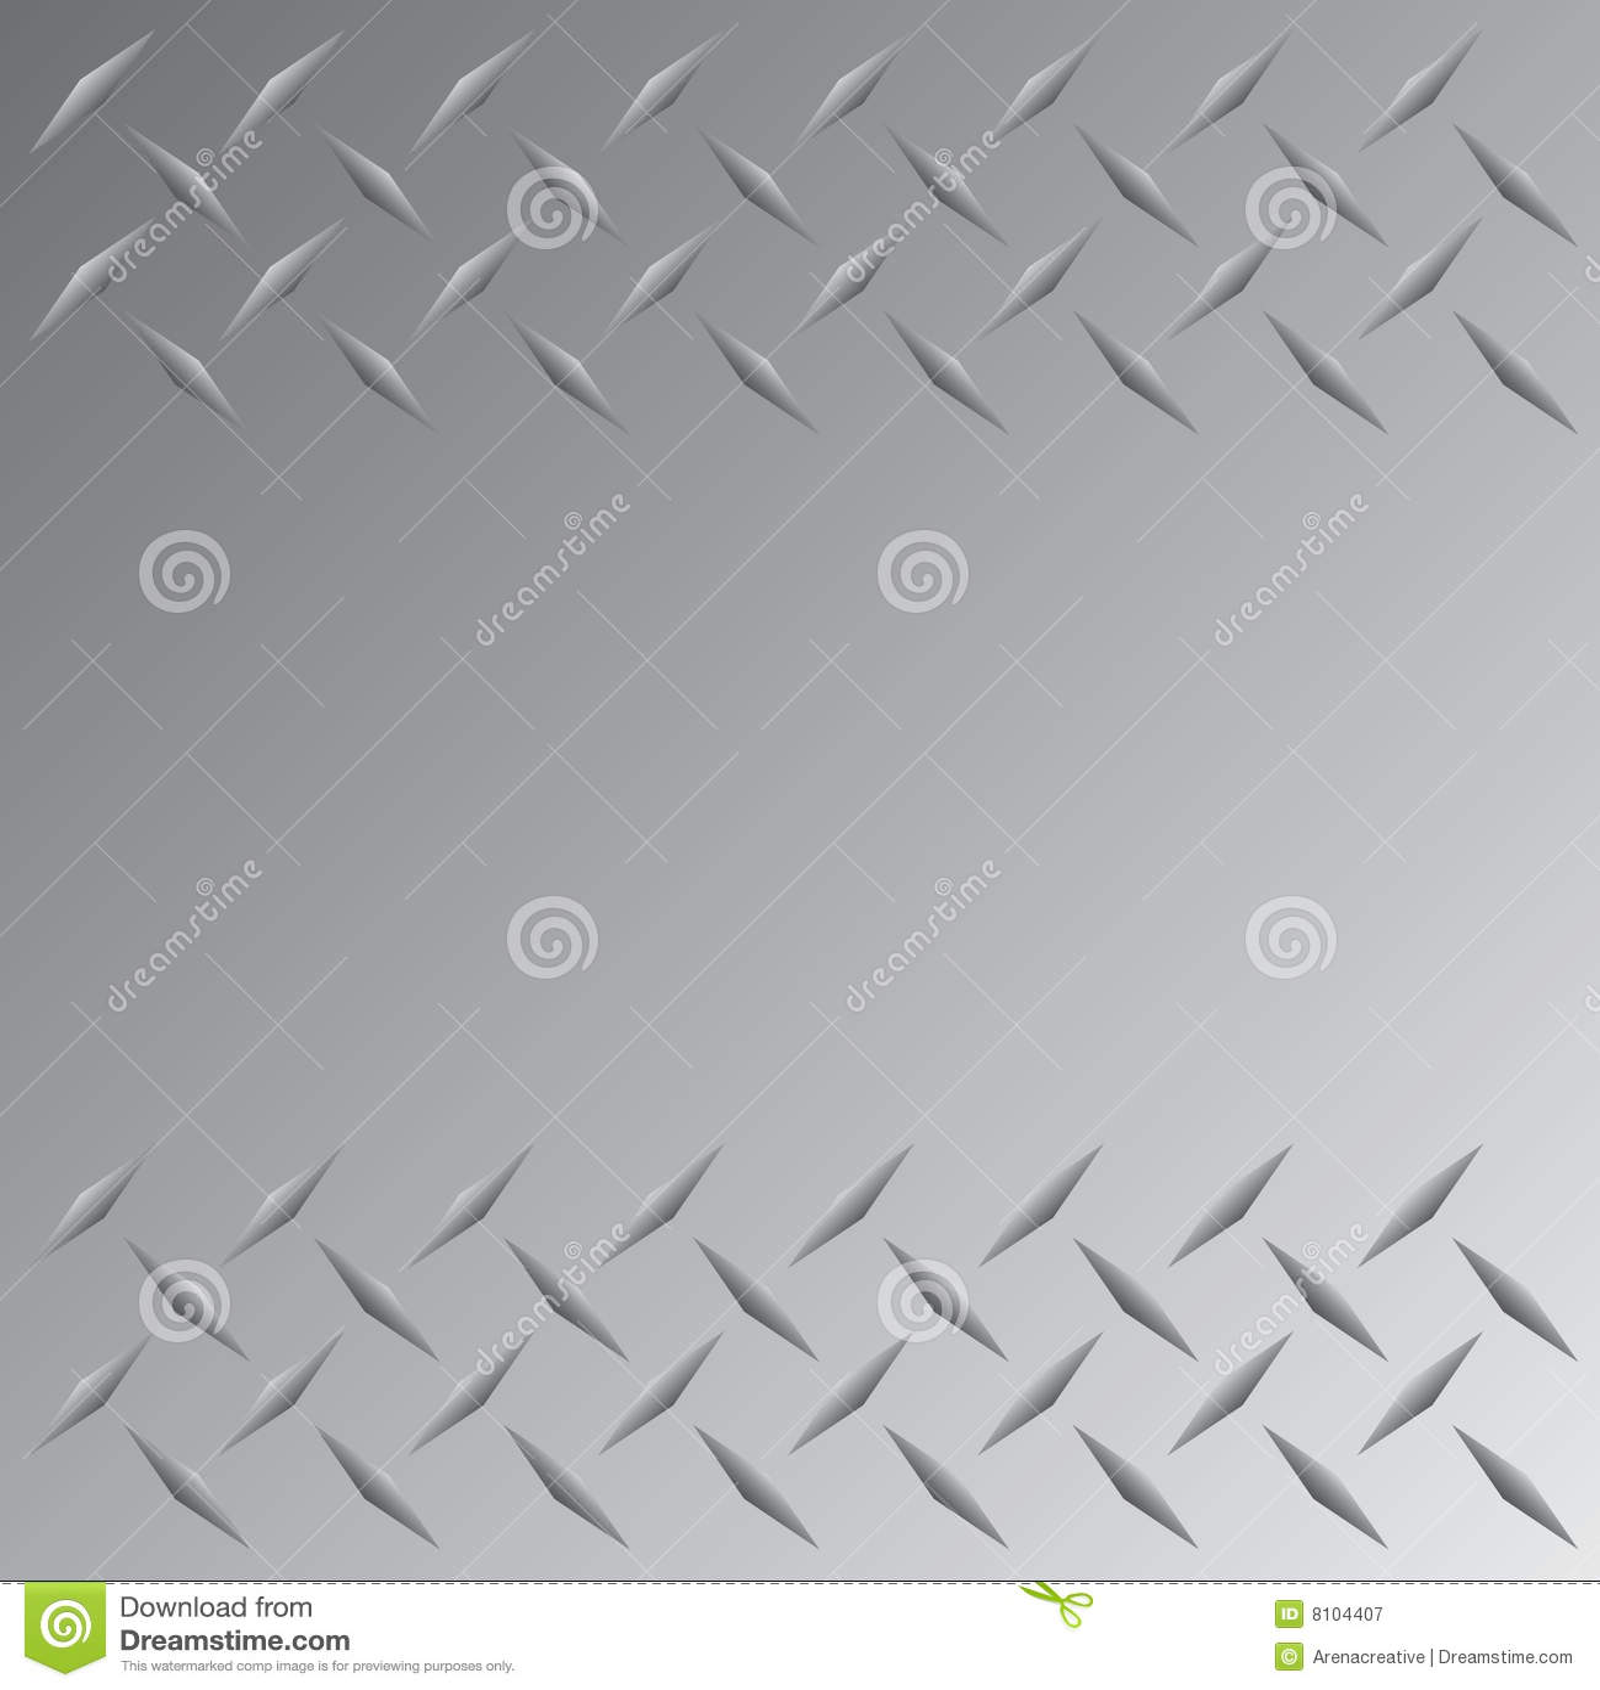 diamond plate metallic border-#18